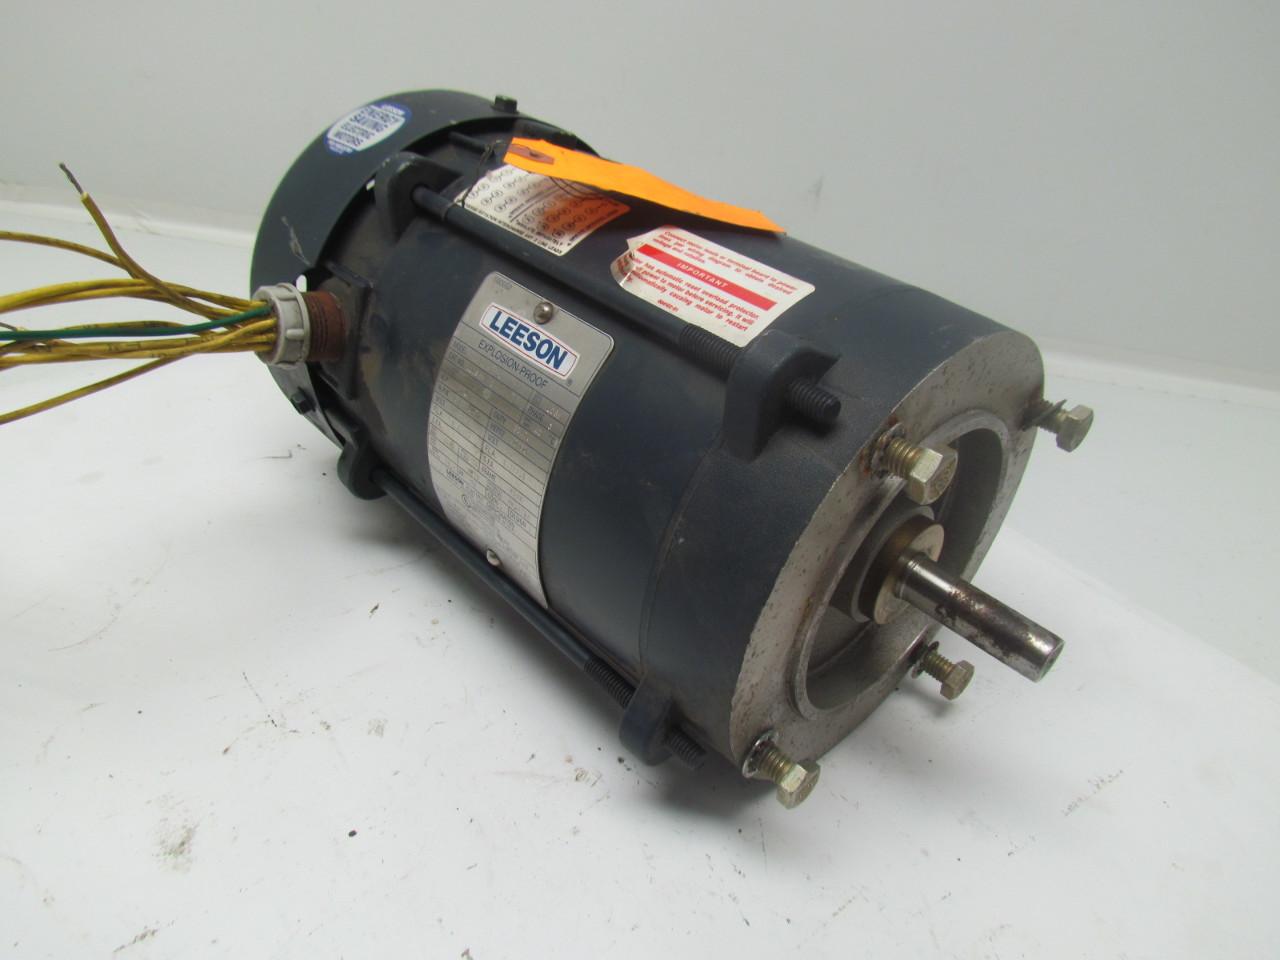 Leeson a6t17xc22g 1hp 1725 1425rpm 3ph f56c frame for Leeson explosion proof motor